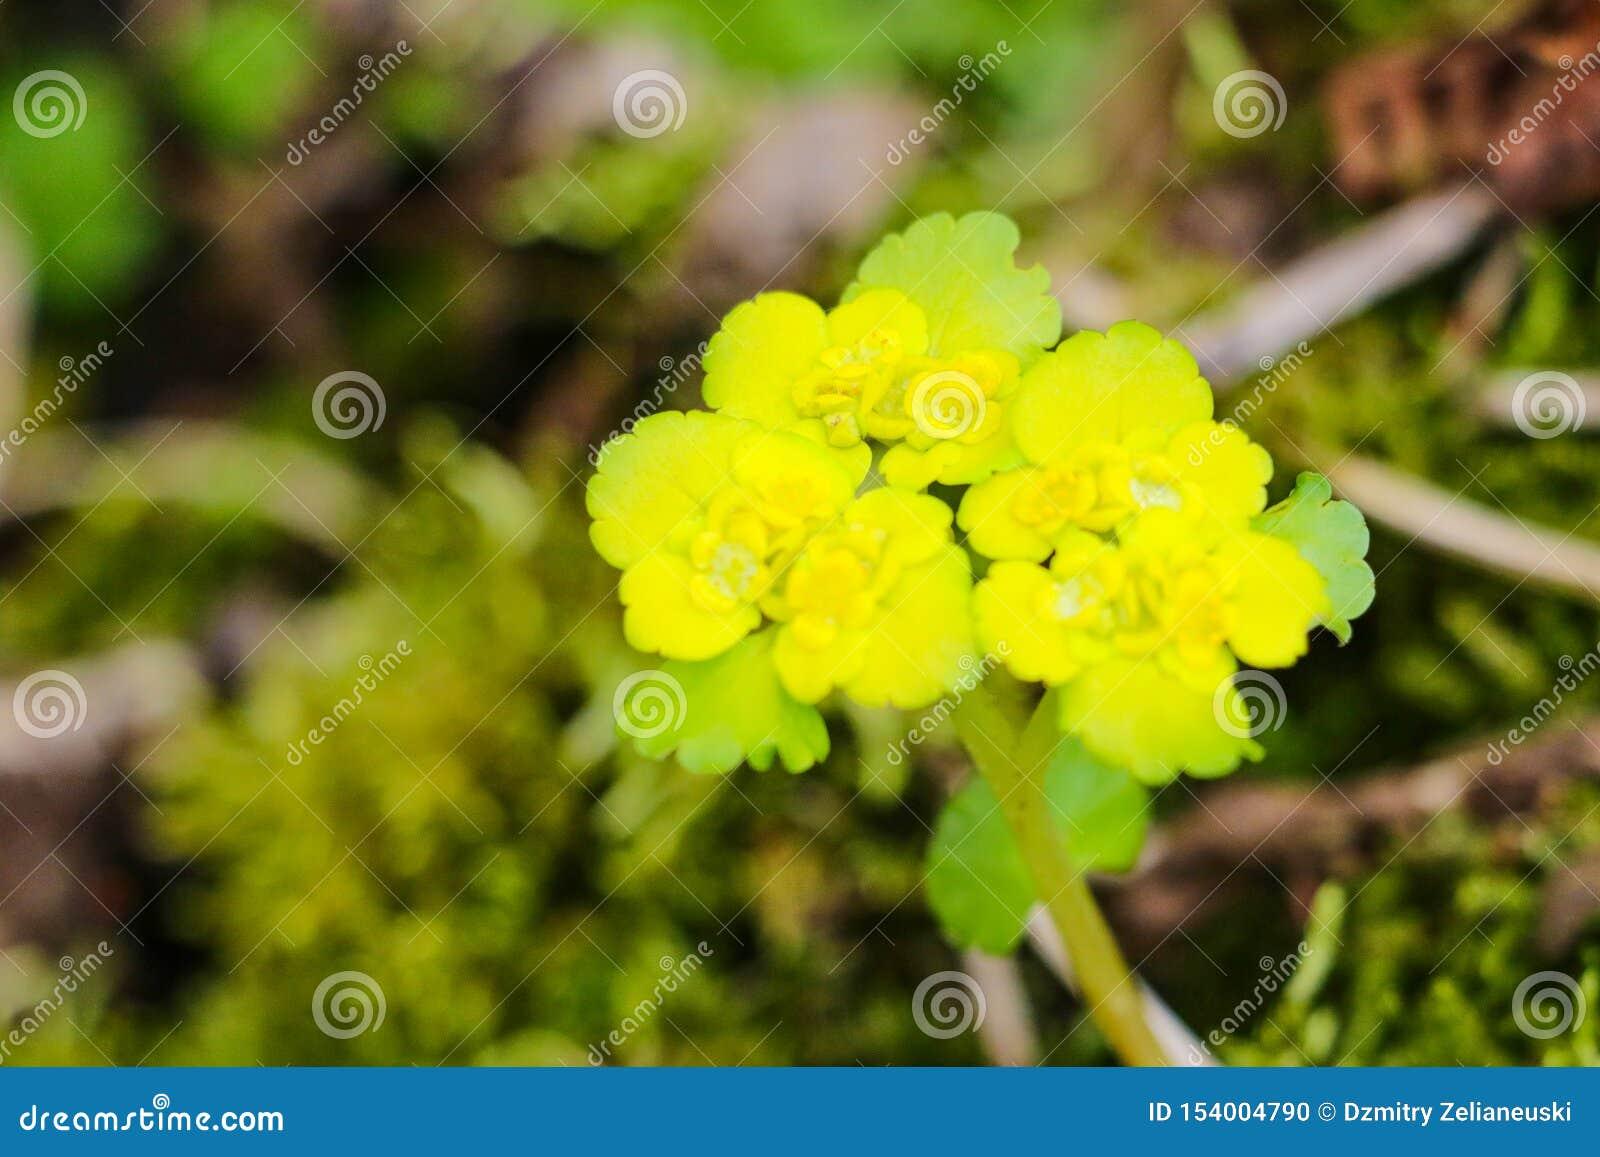 Blomma vit senap, sinapisalbum, blommor, natur